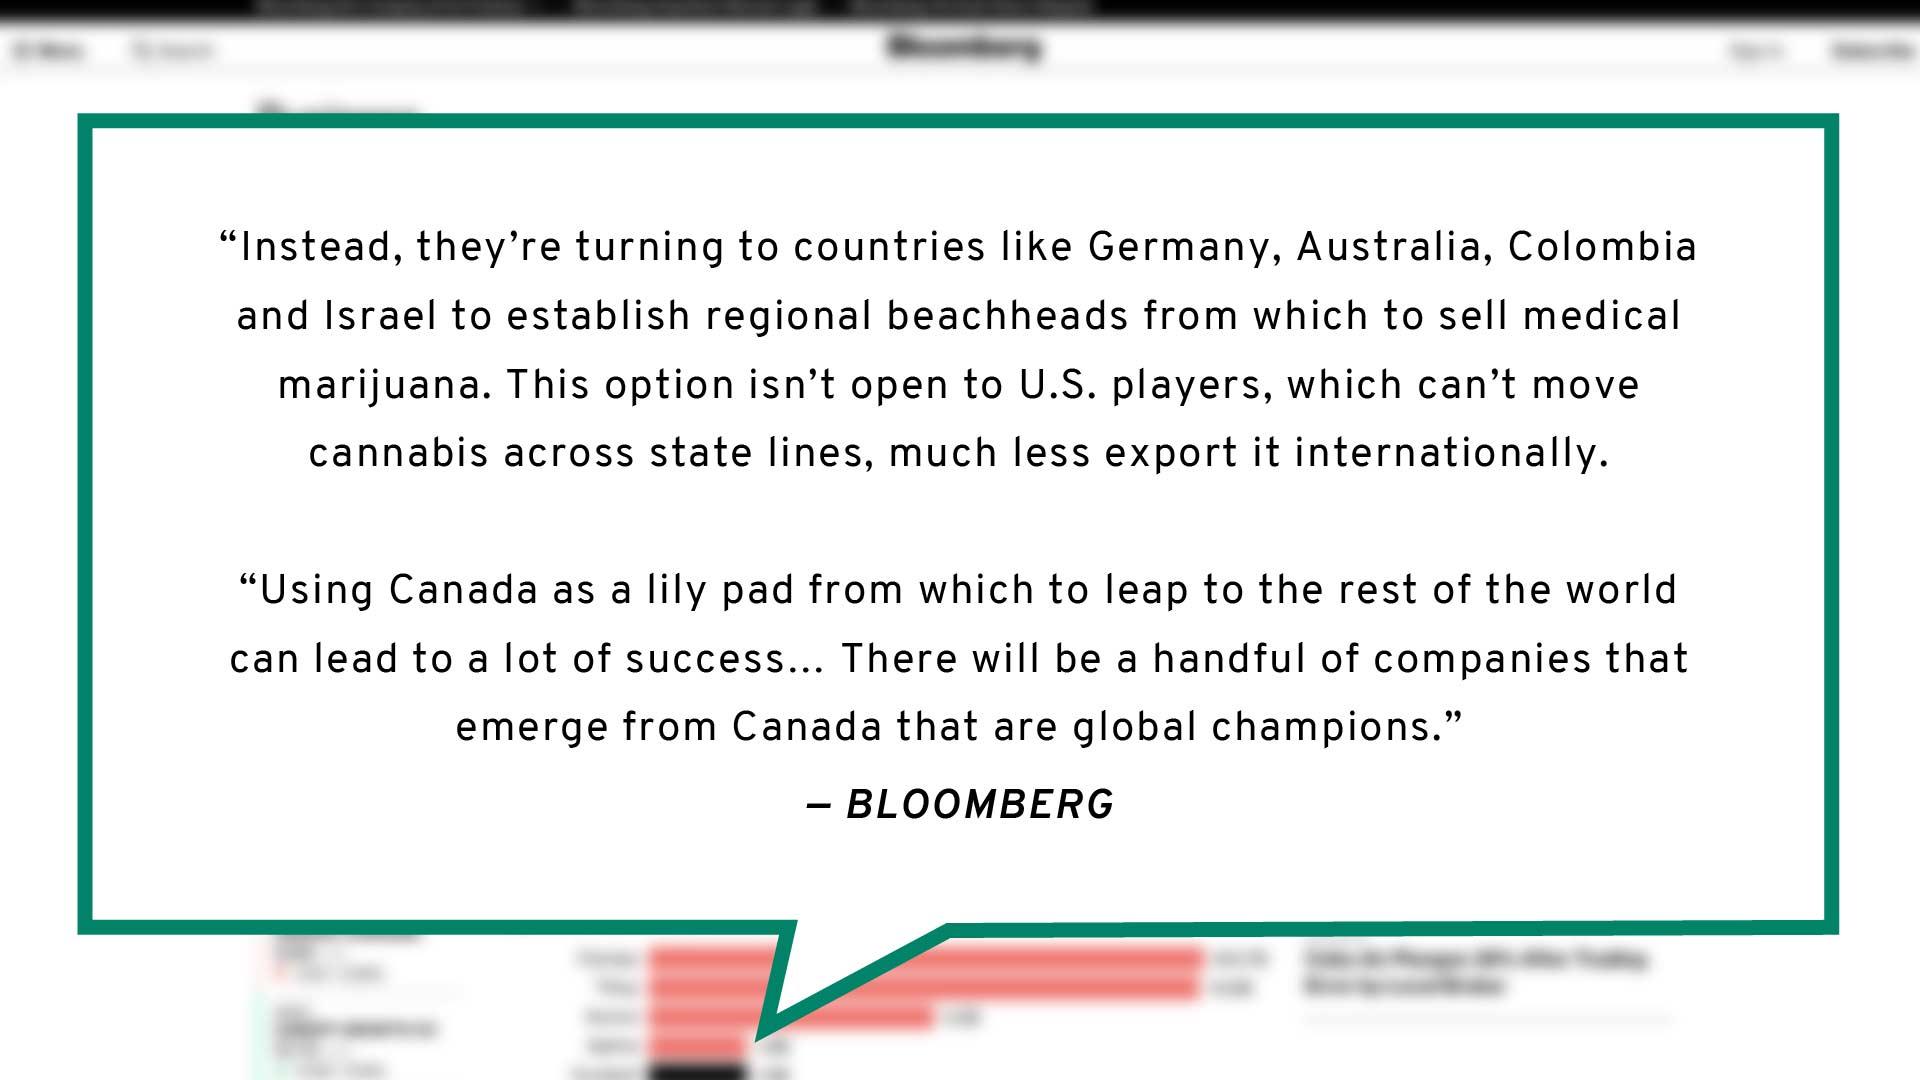 Bloomberg Quote